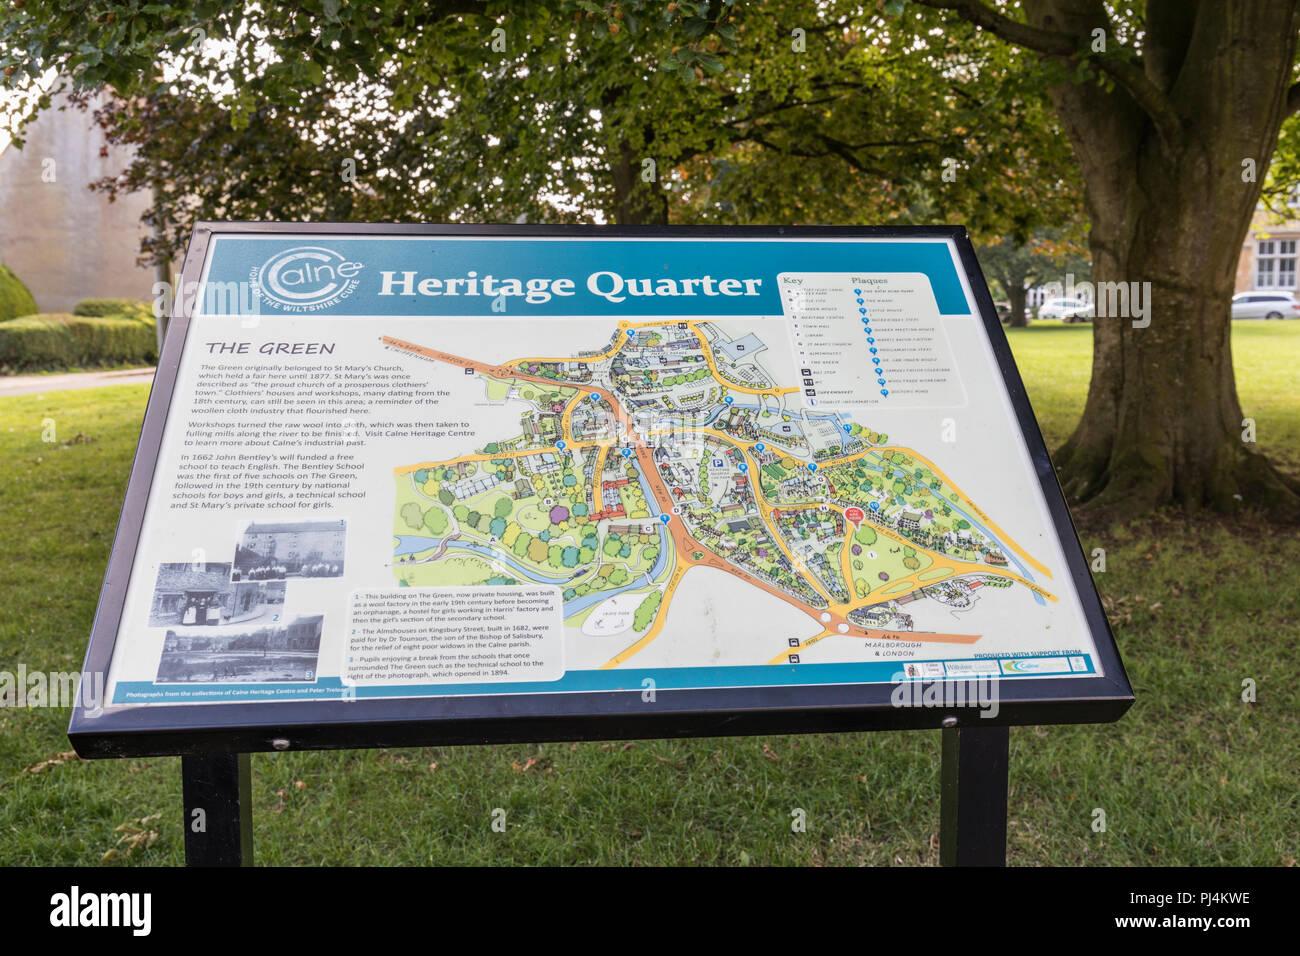 Heritage Quarter Interpretation board on The Green, Calne, Wiltshire, England - Stock Image